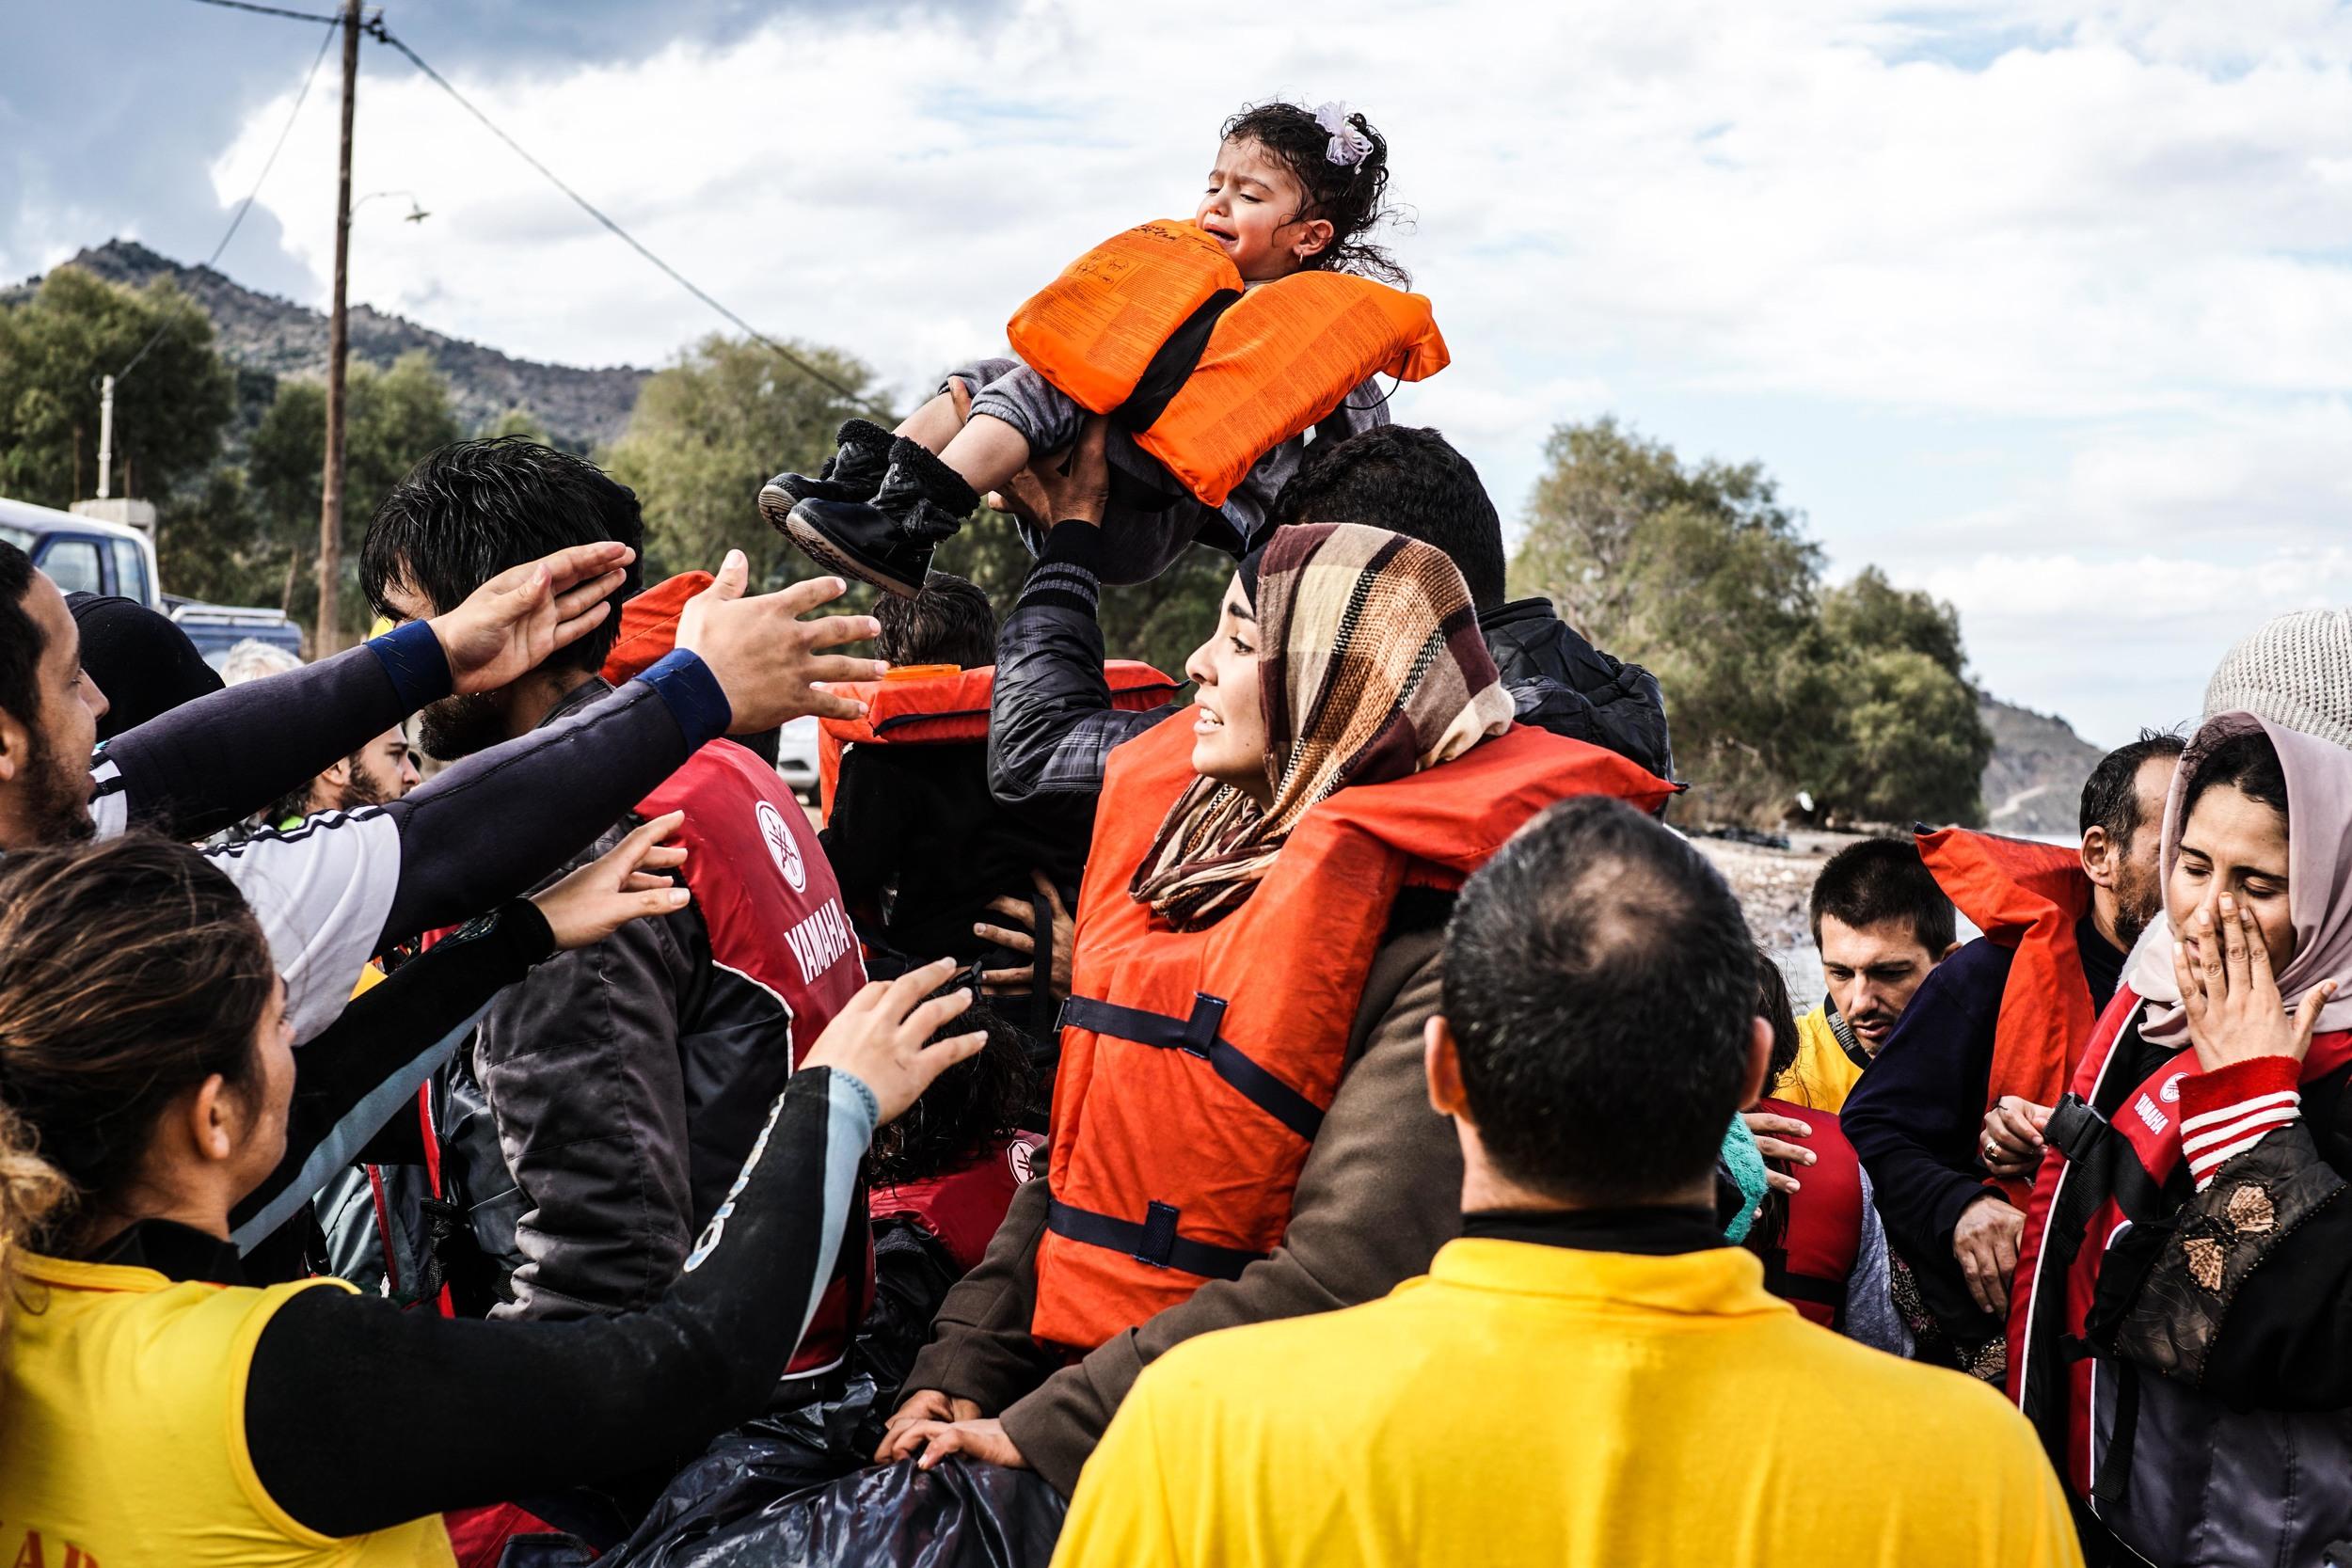 Syrian Refugee Crisis Lesbos Greece November 2015 13.jpg